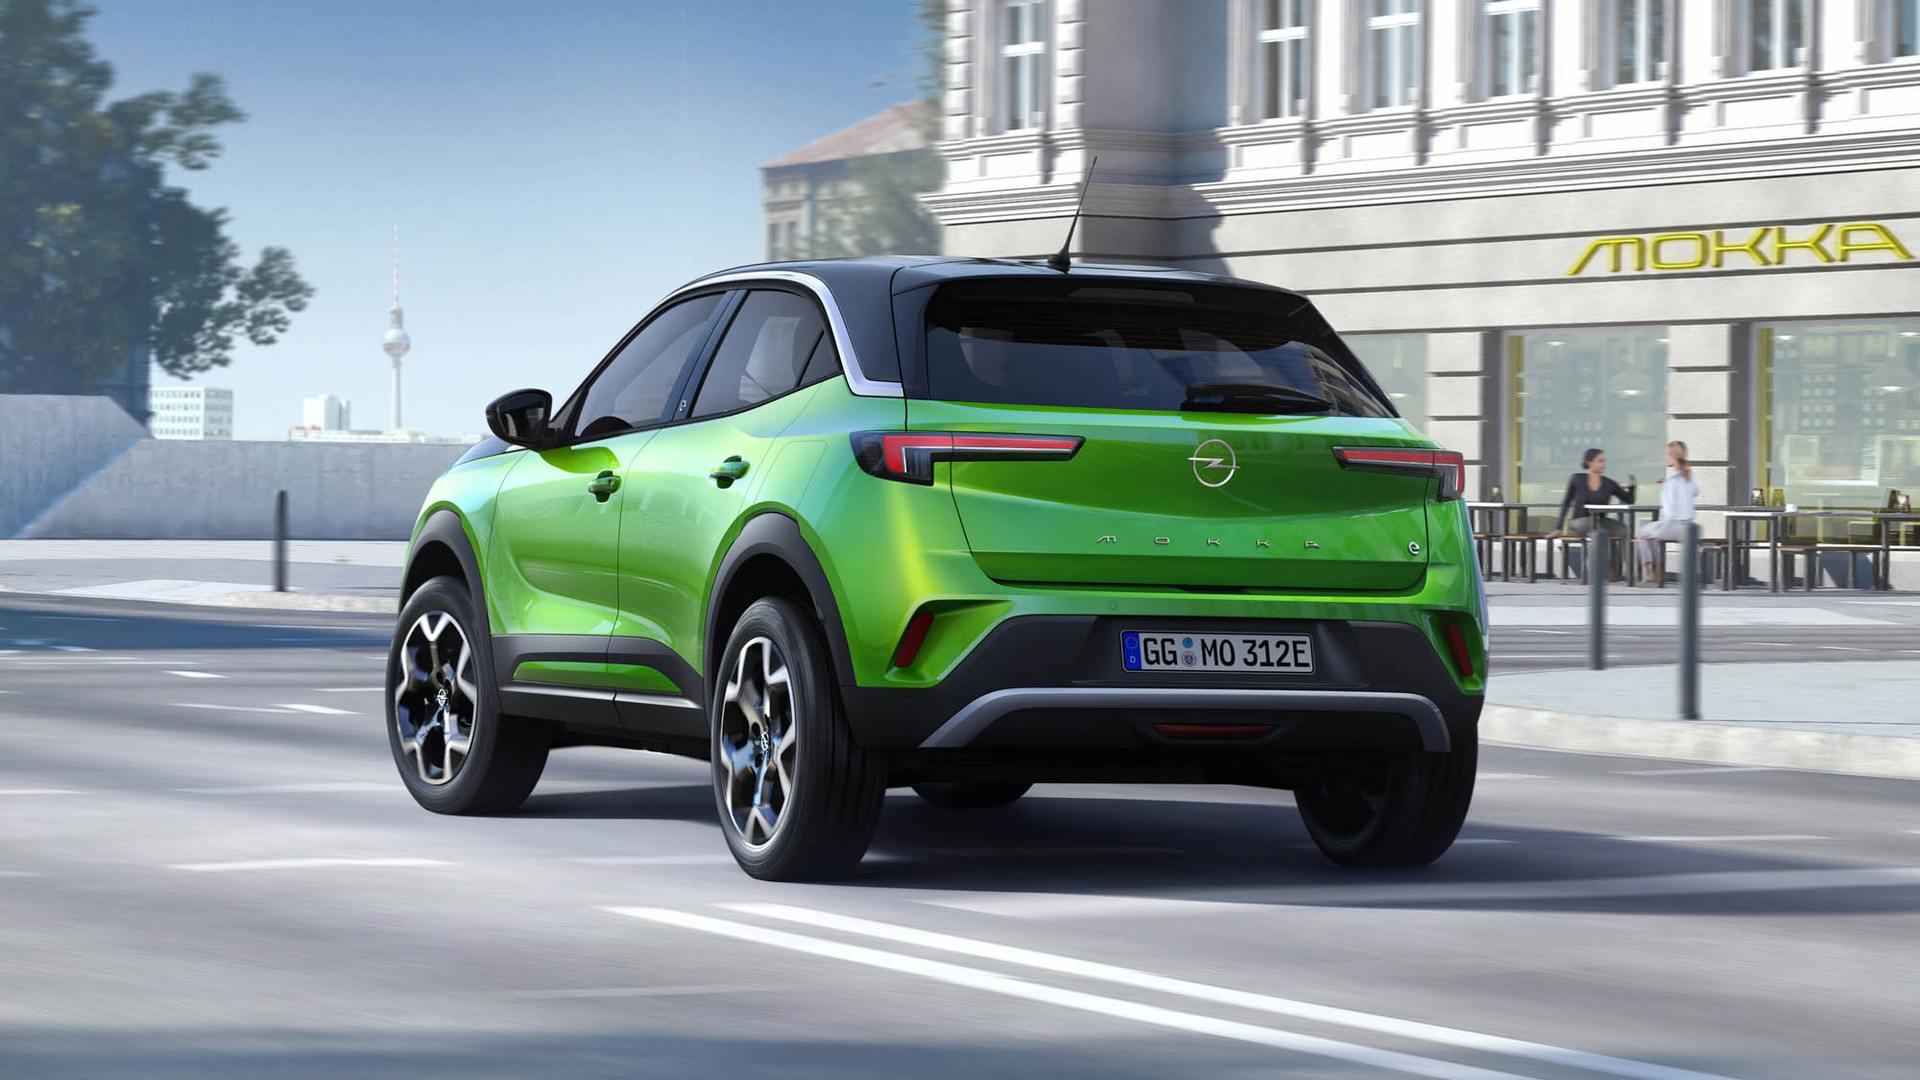 opel mokka 2021 03 - Apple CarPlay og surroundlyd